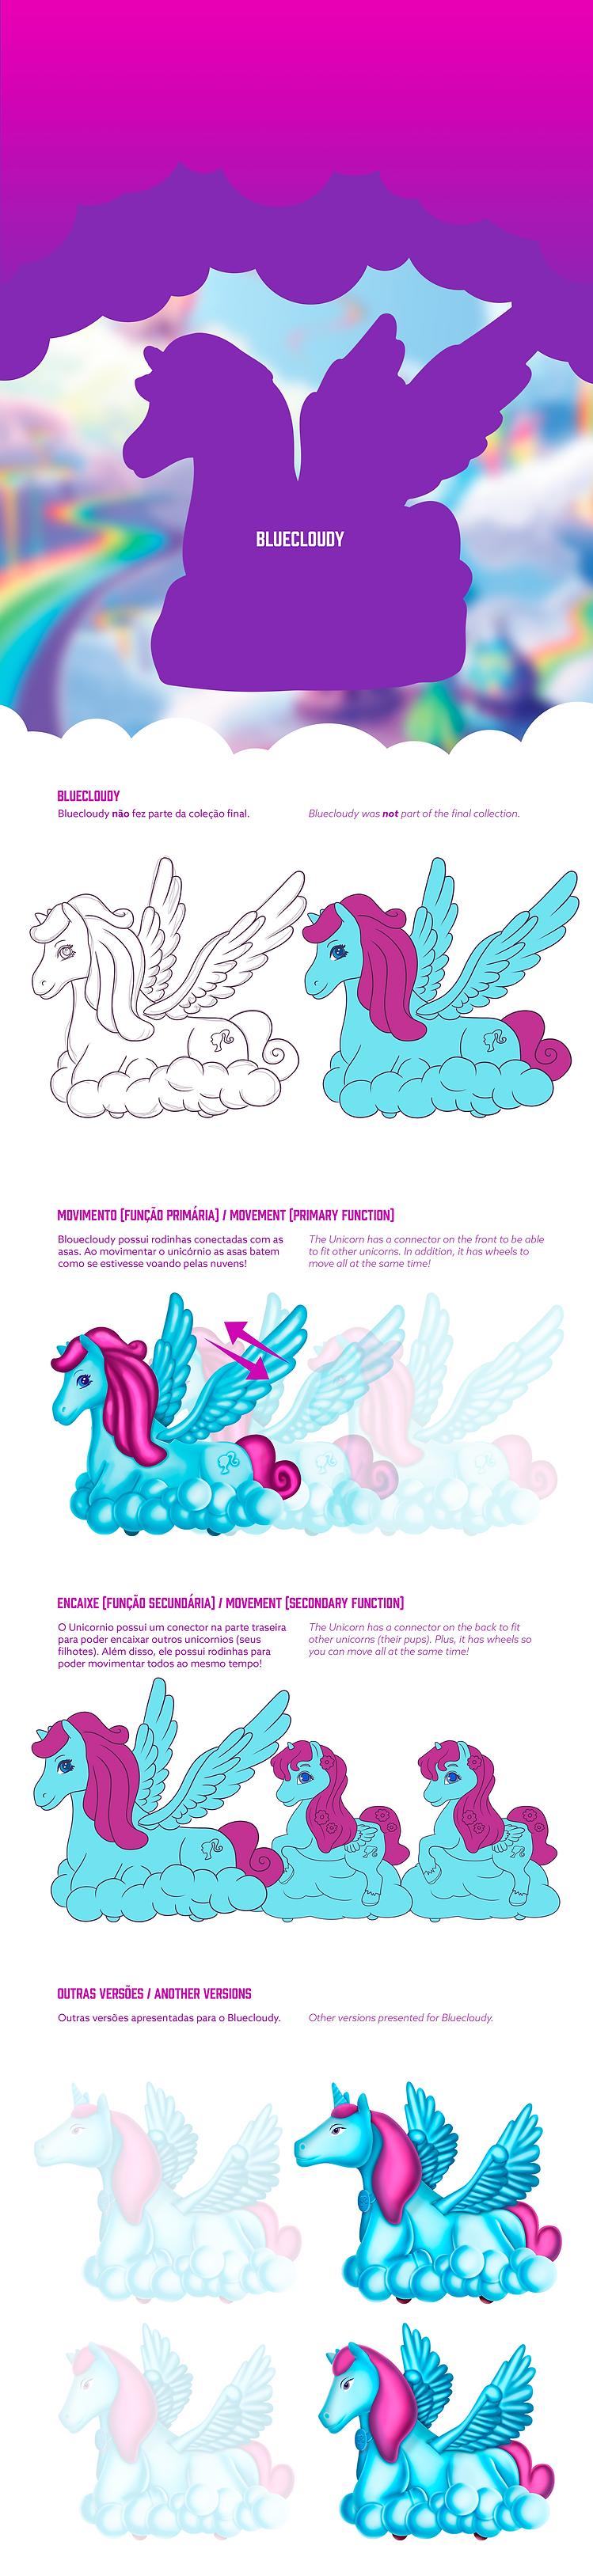 Behance---Barbie-Clouds---06A.png